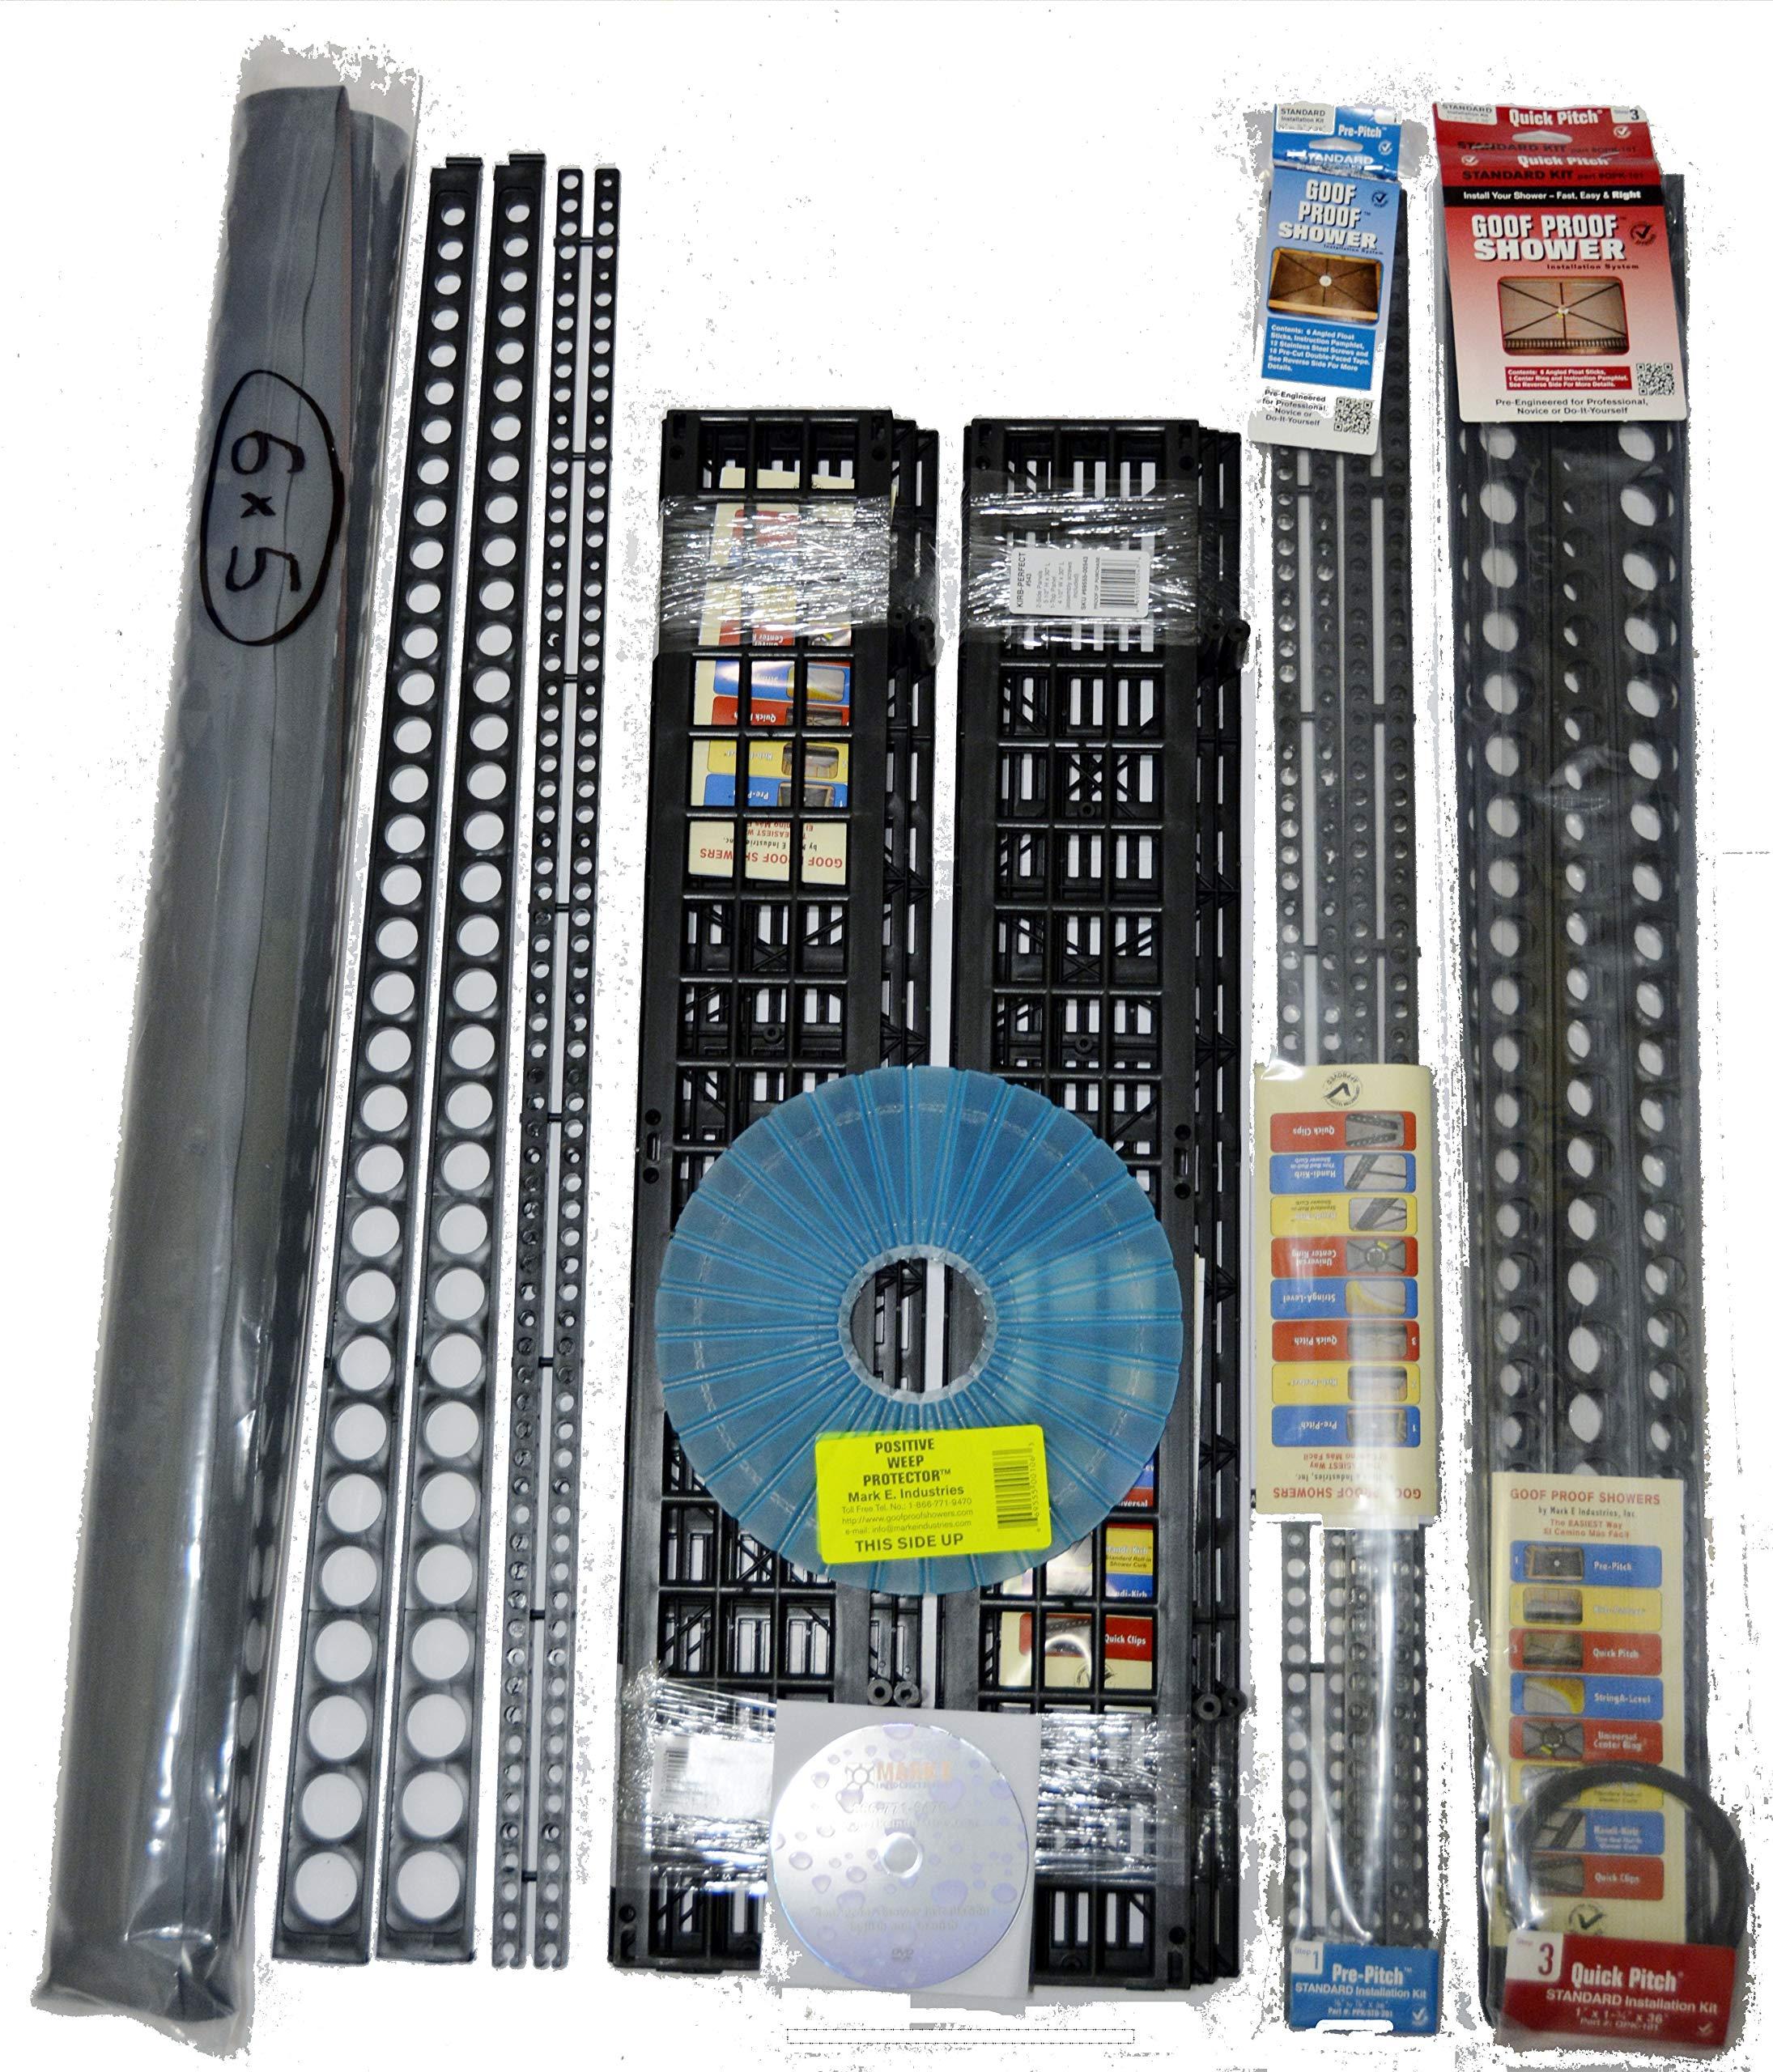 Standard Shower Kit 6 in 1 with 2 - Extra Pre-Pitch Sticks ''STD-201'' + 2 Quick-Pitch Extra Float Sticks XFS-101.2 Sticks …